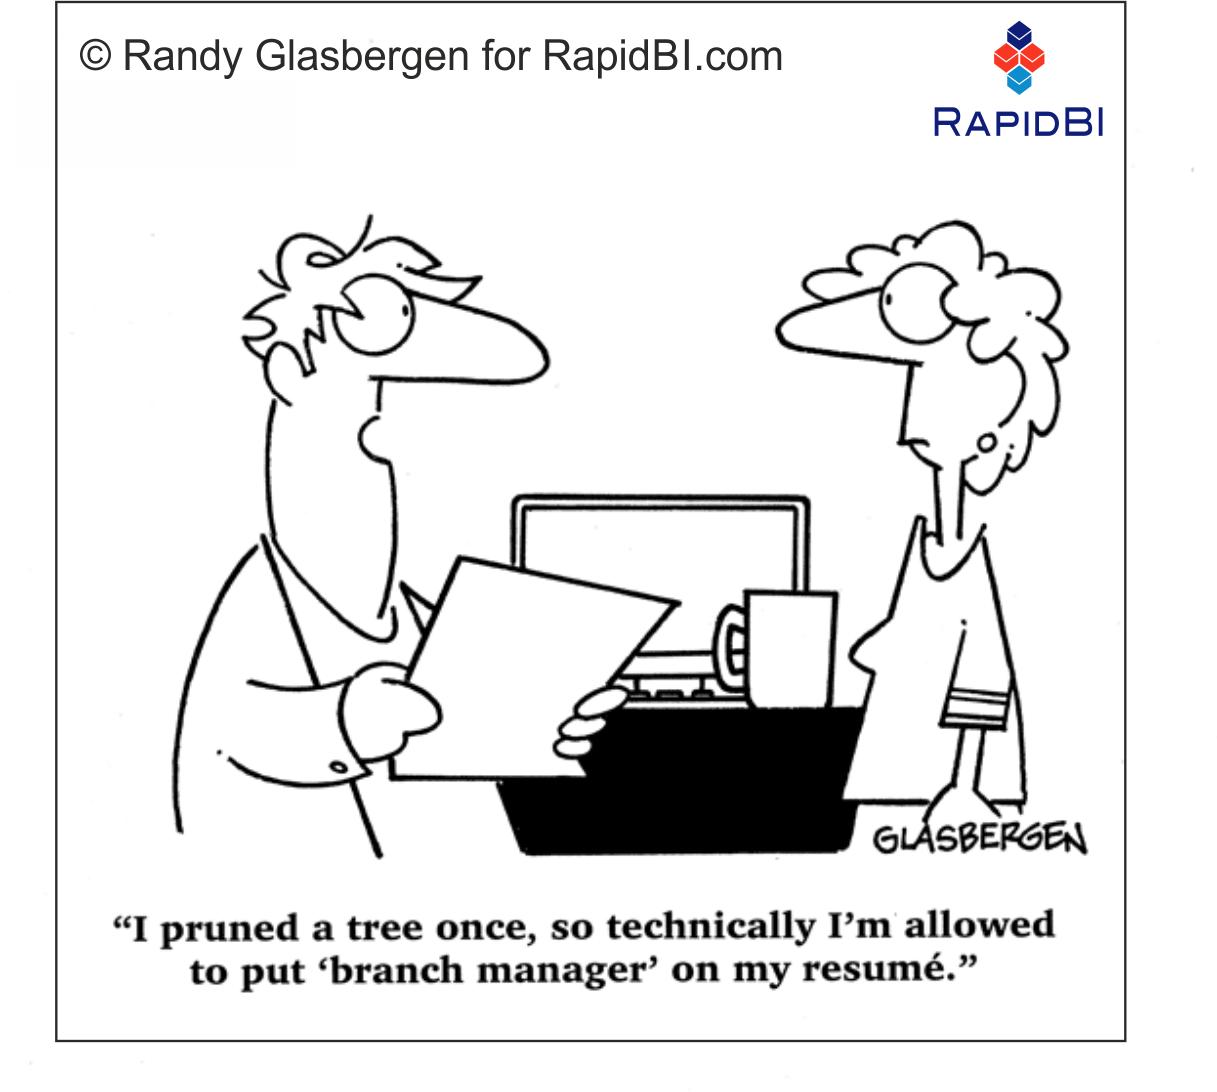 RapidBI Daily Business Cartoon 163